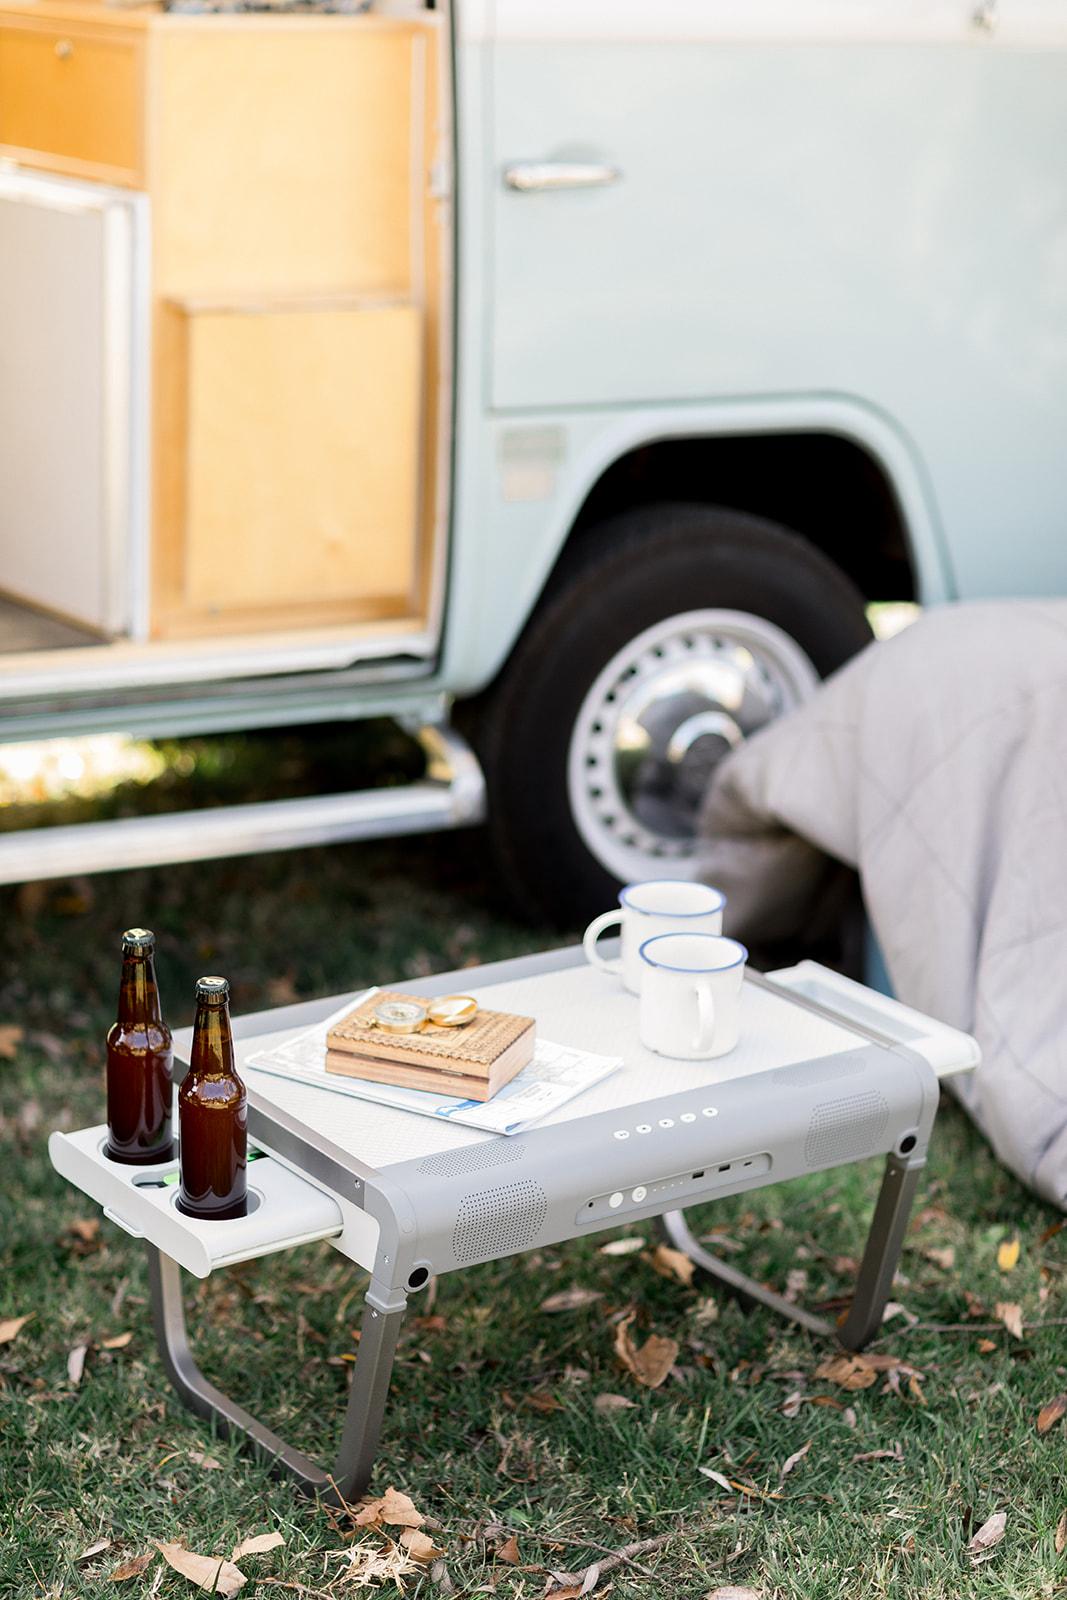 PorTable-Smart-Table-Product-Photos-177.jpg